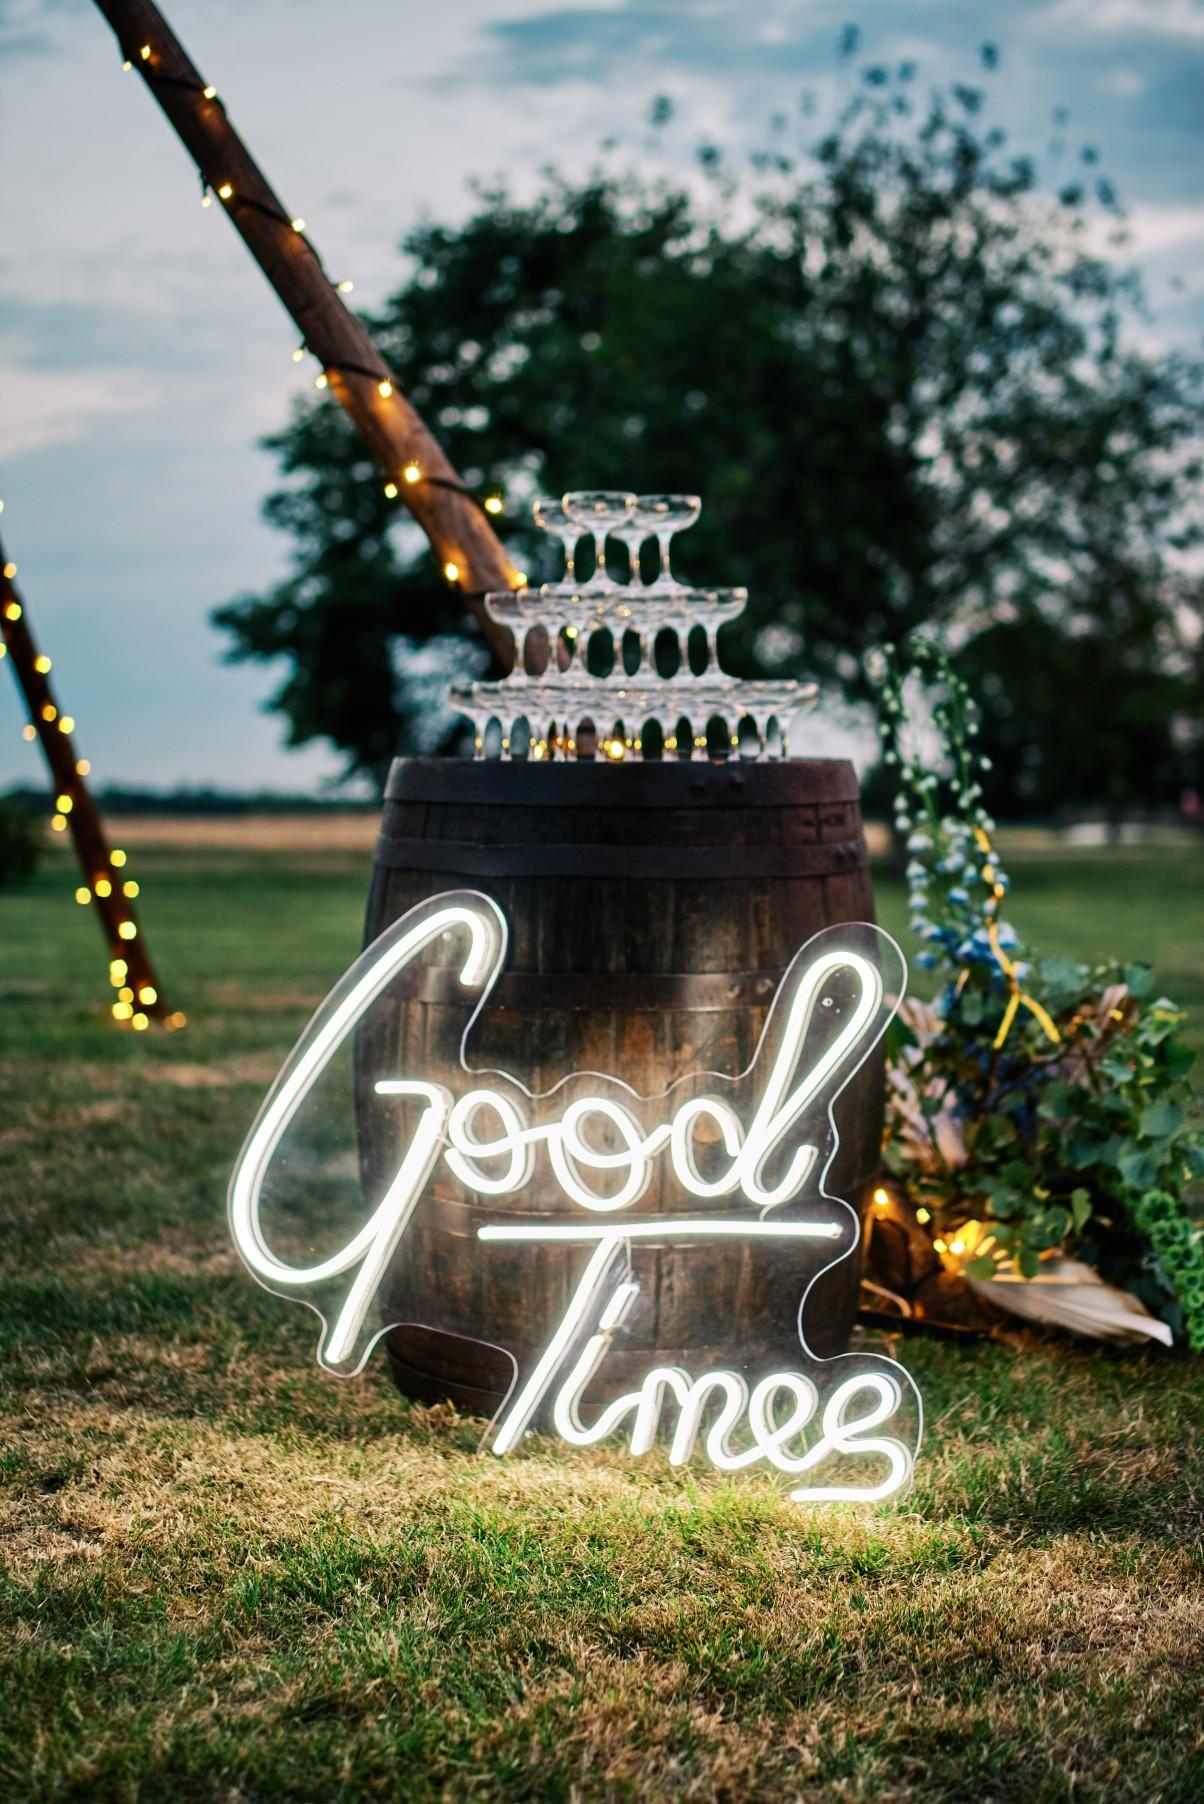 nhs wedding - paramedic wedding - blue and gold wedding - outdoor wedding - micro wedding - surprise wedding - neon wedding sign